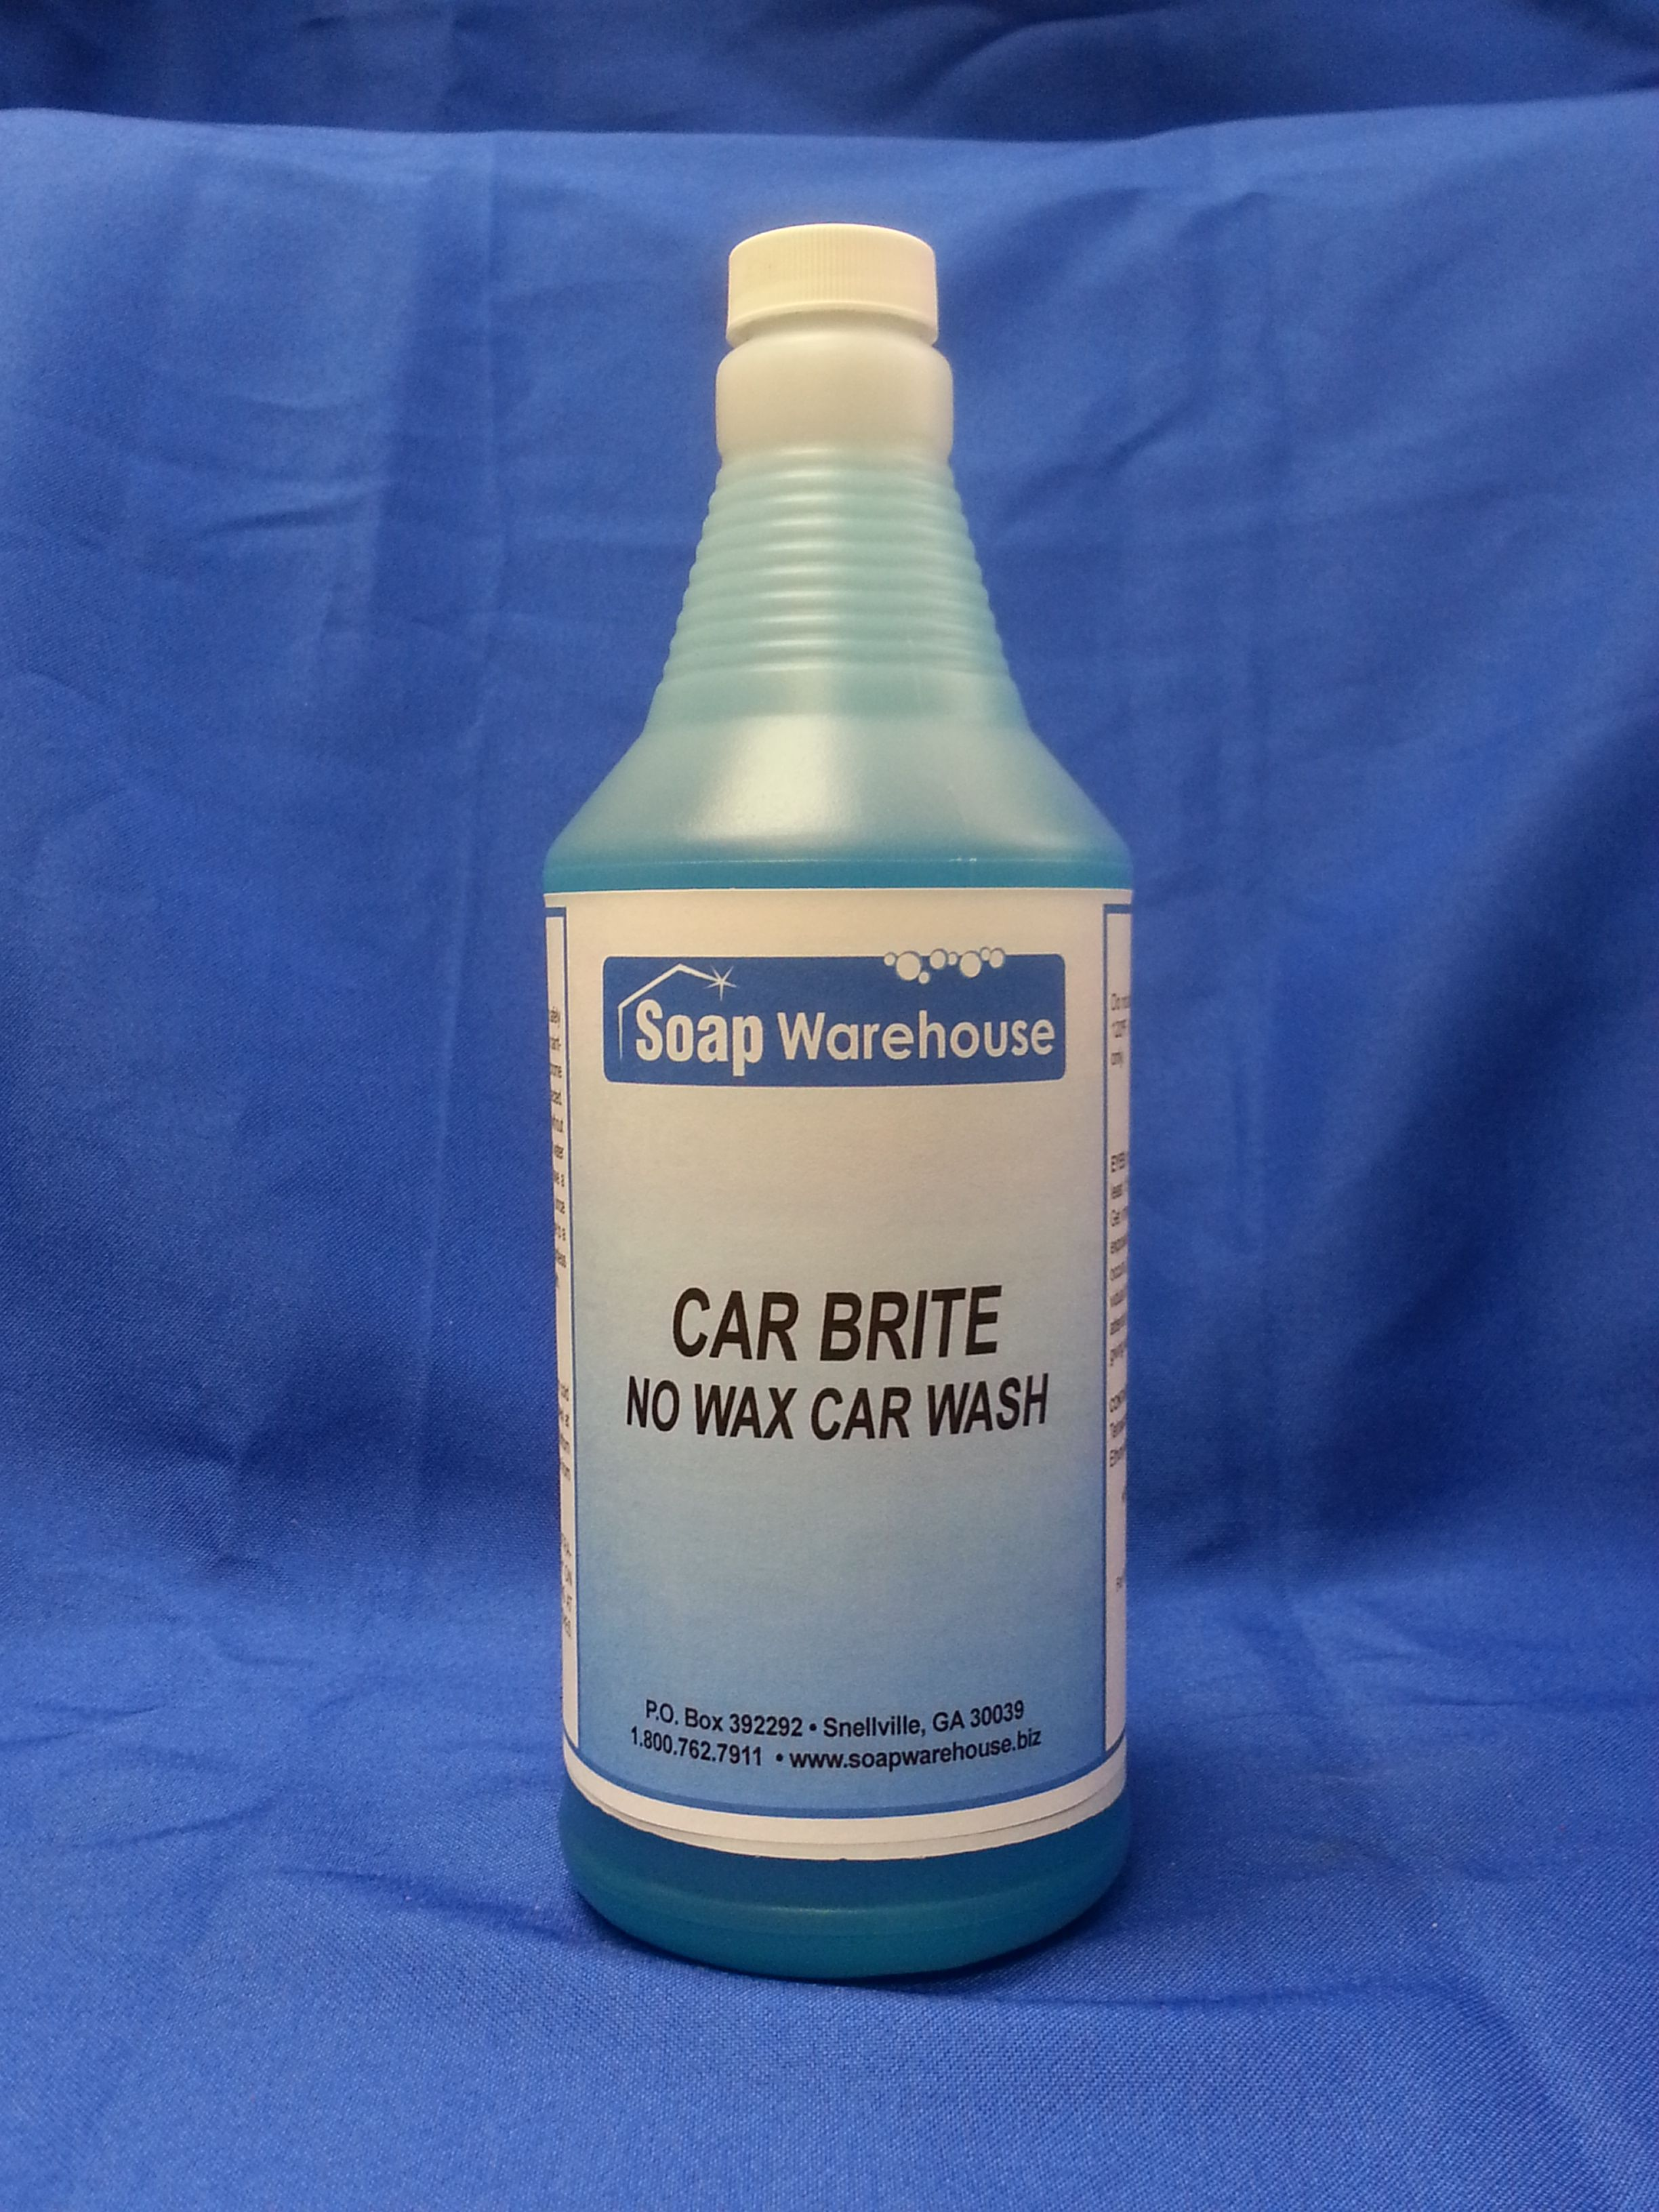 Car brite car wash 12 for 1 gallon car brite is a safe finish